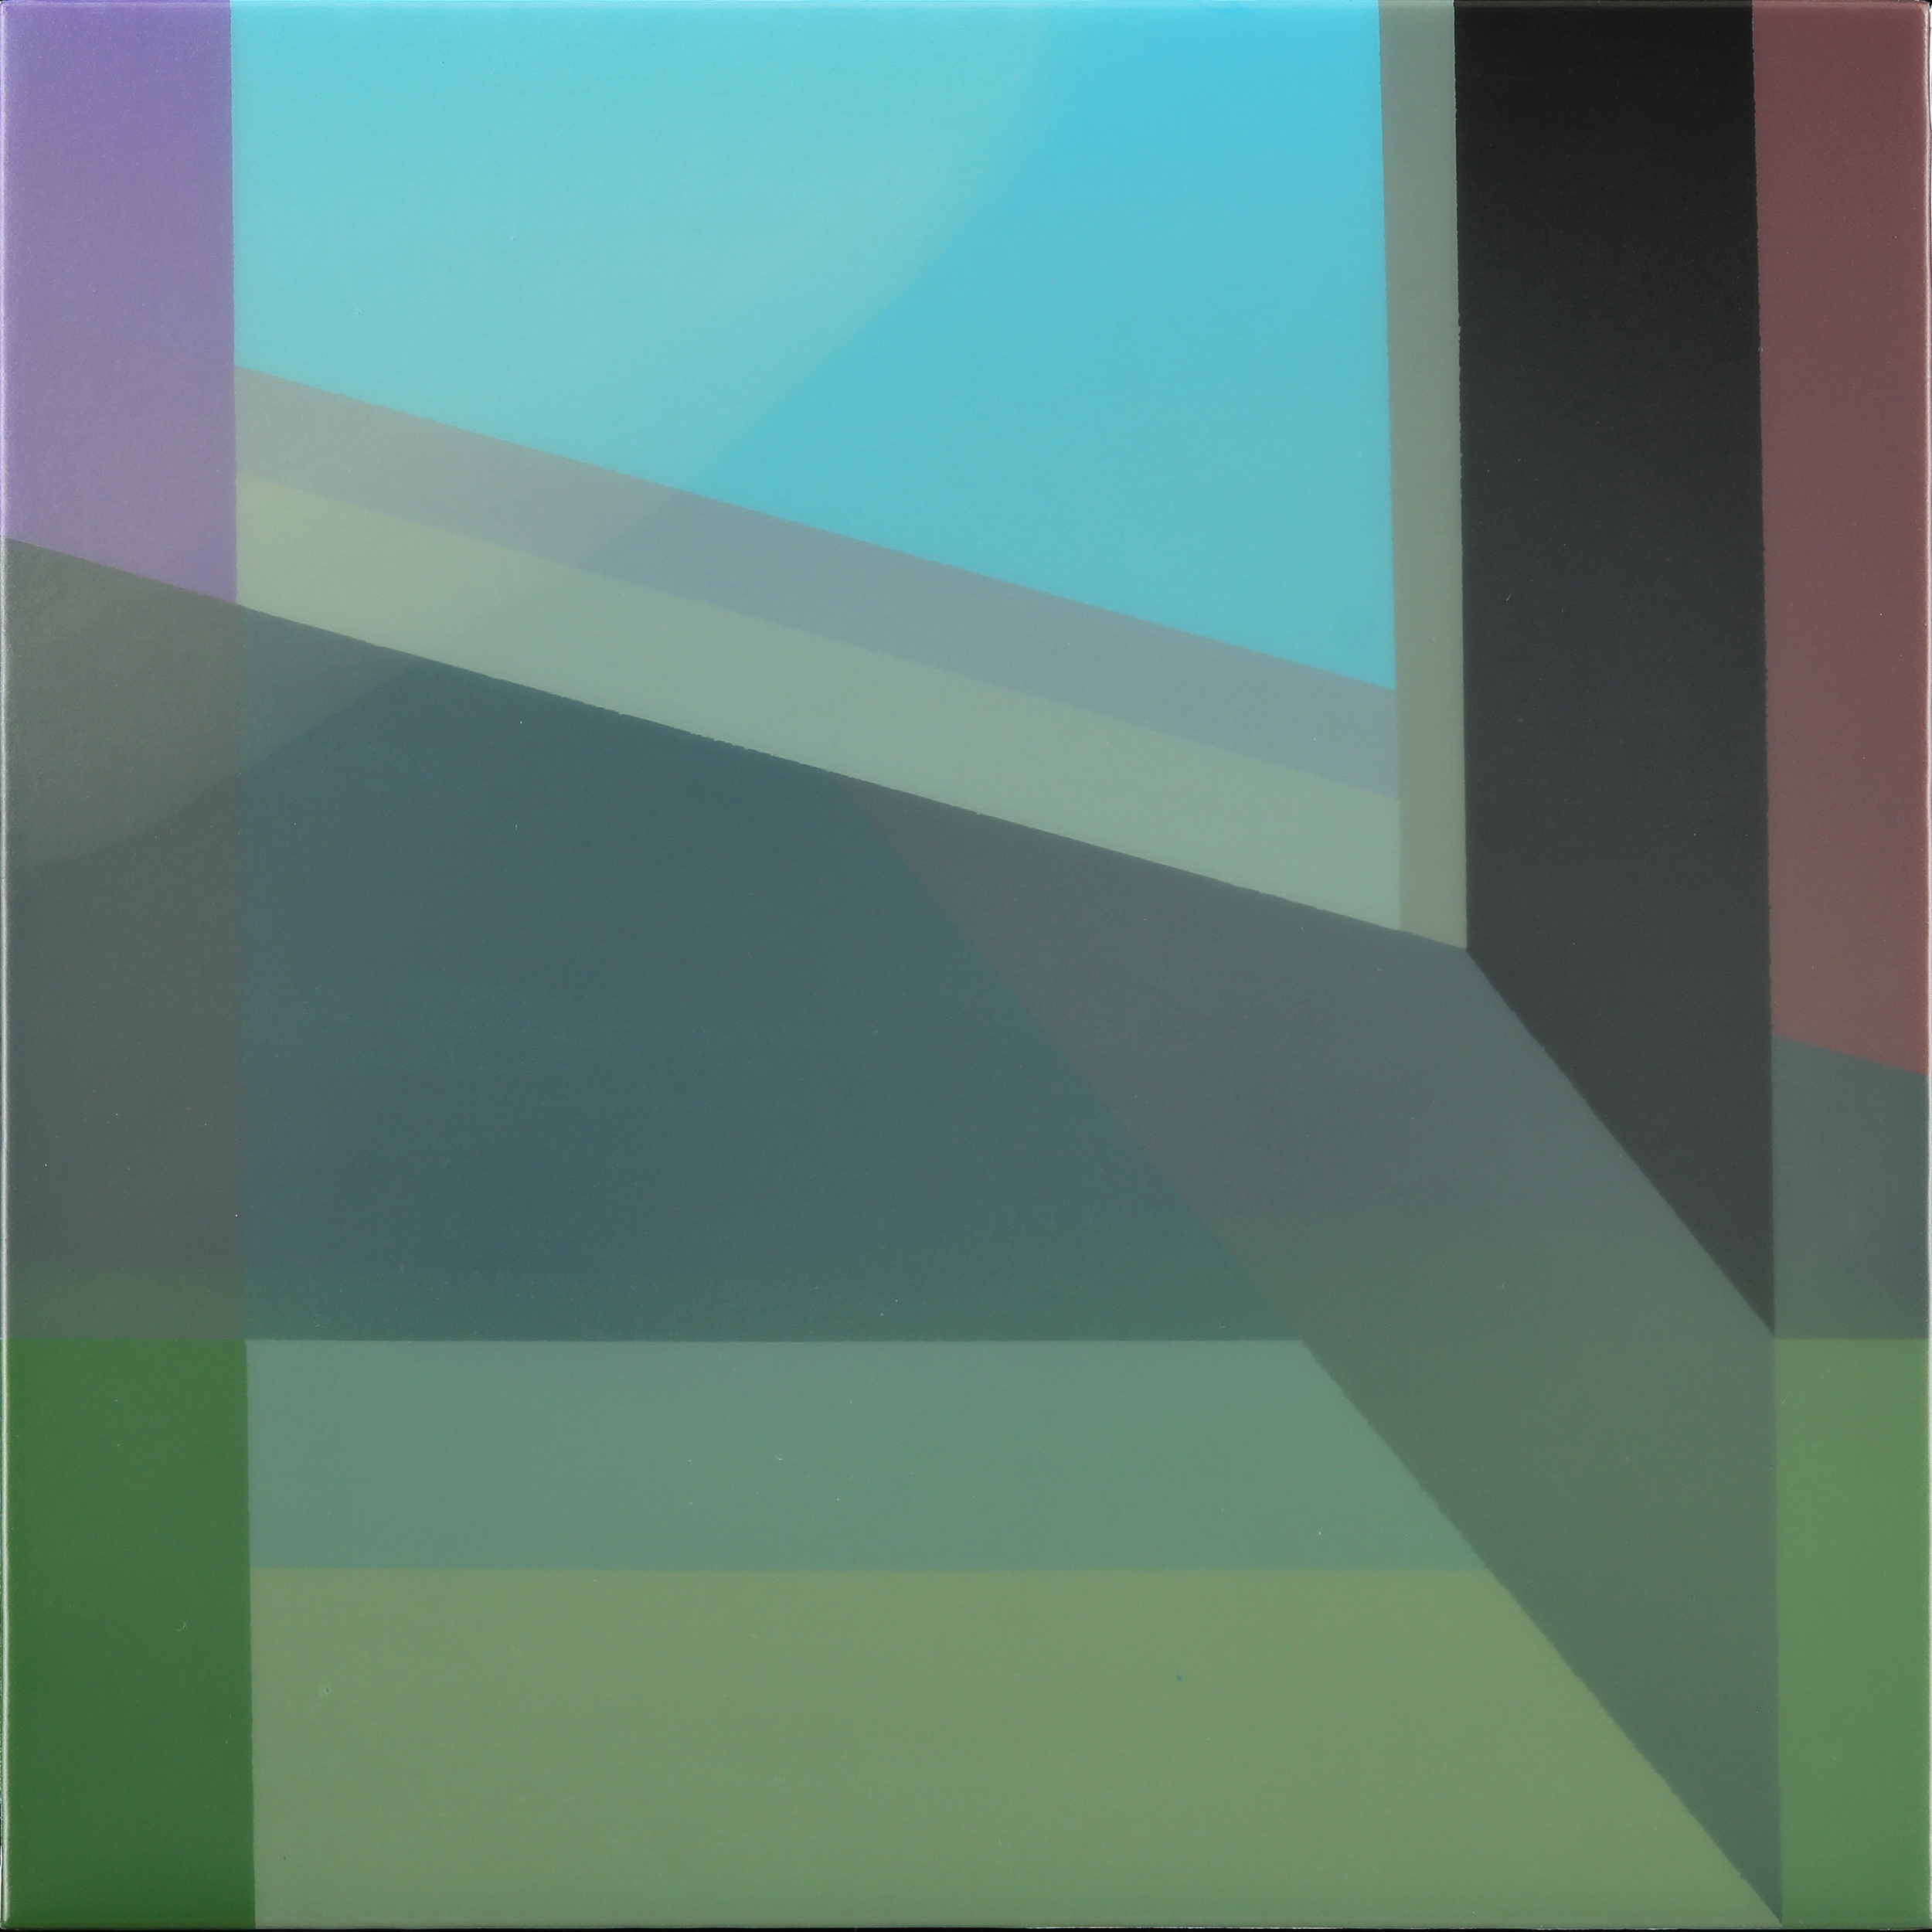 """Level 1"", Acrylic on canvas over panel, 16"" X 16"", 2015."